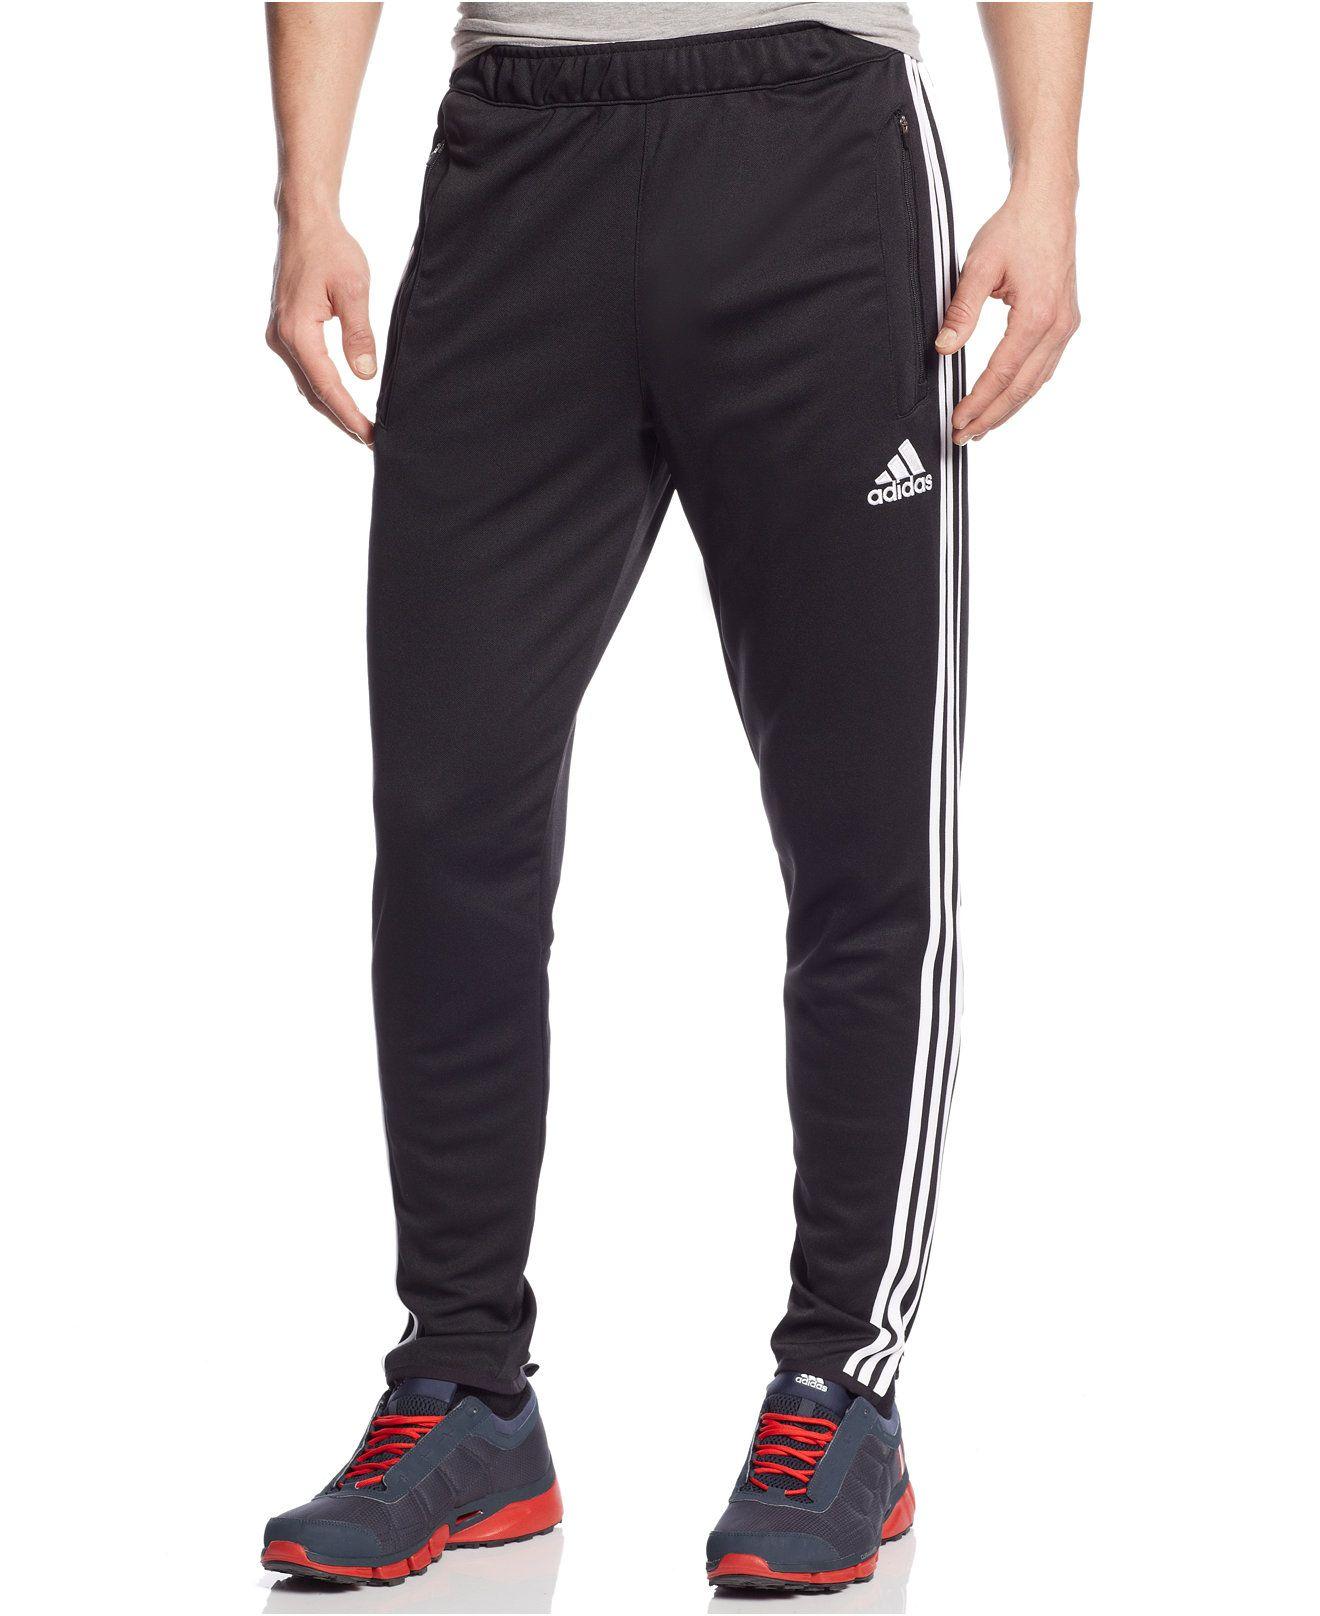 big sale c7cd5 2845c adidas Tiro 13 Training Pants - Active Pants - Men - Macys